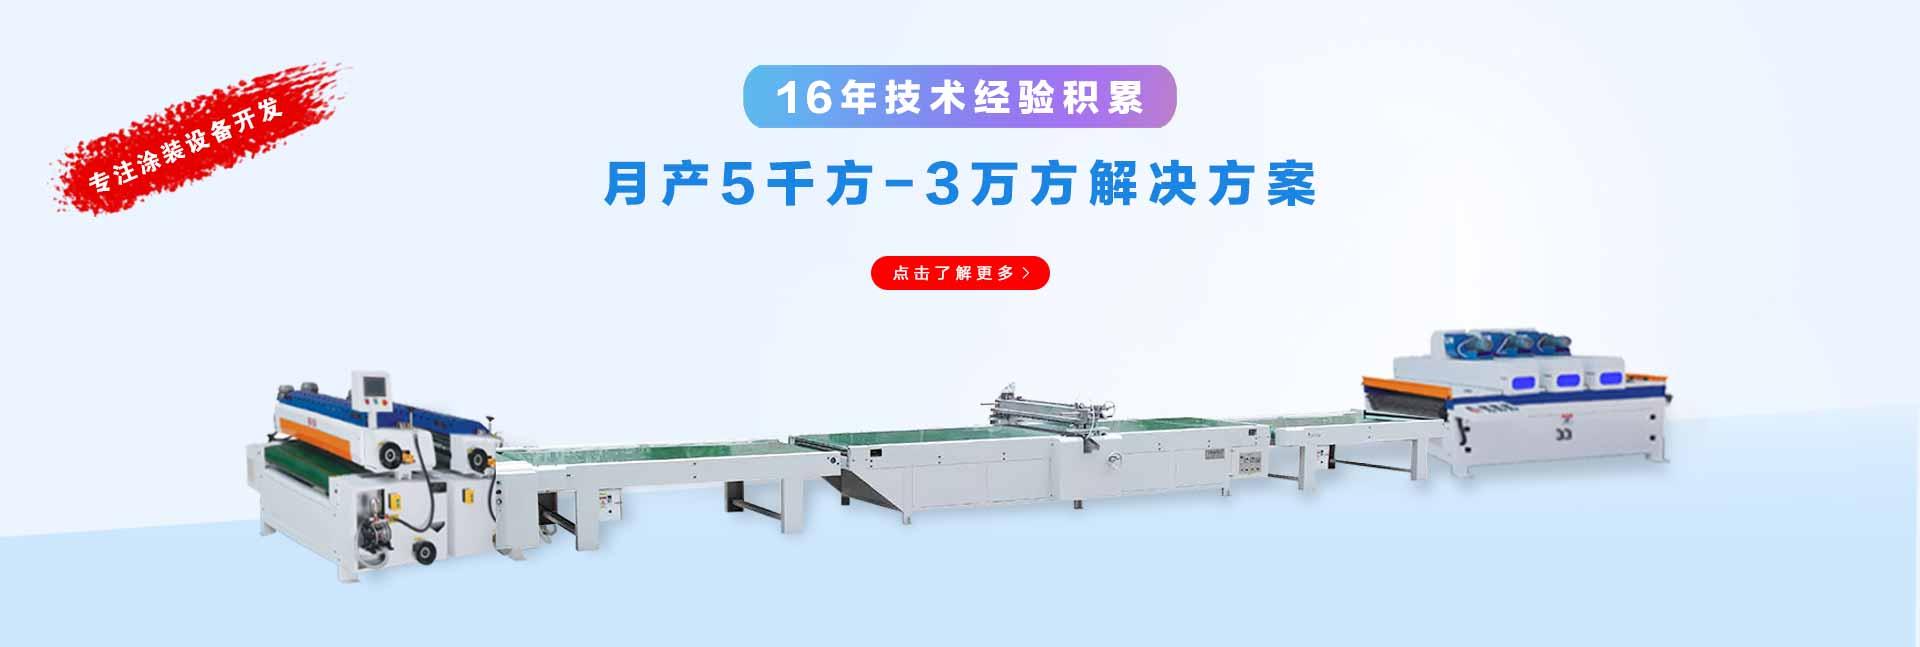 UV涂装生产线解决方案pc端